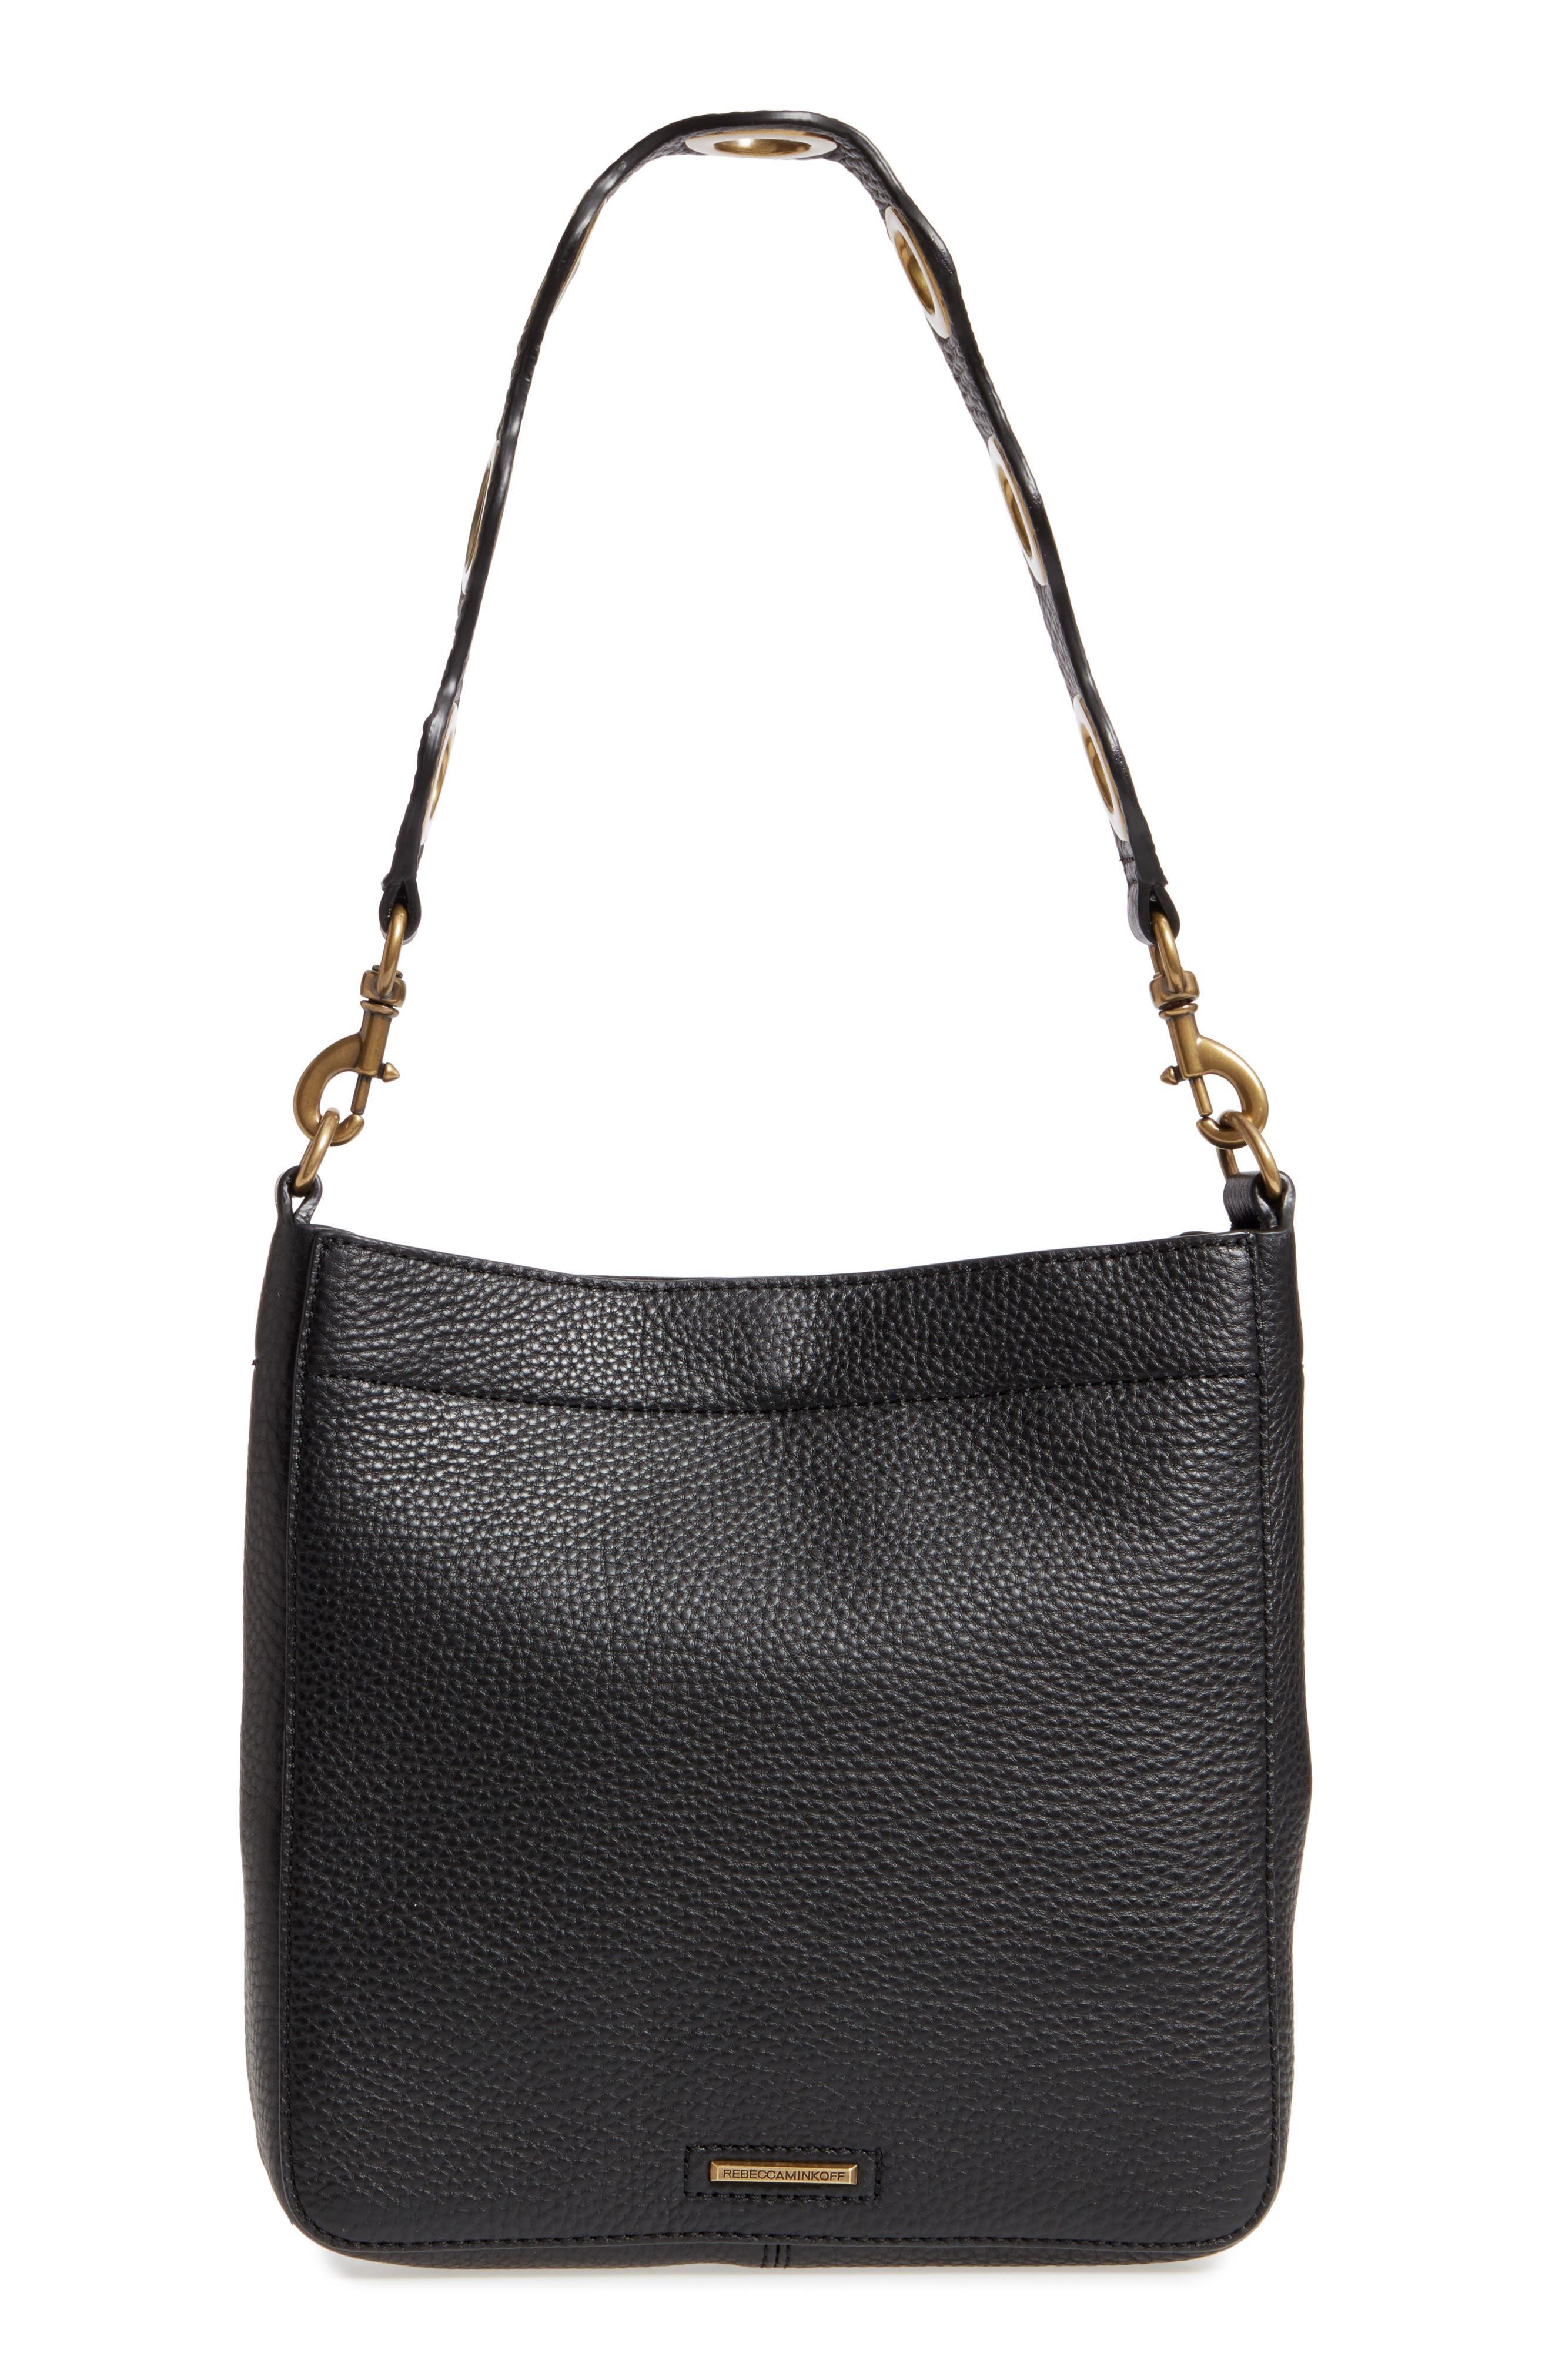 REBECCA MINKOFF, Small Darren Deerskin Leather Feed Bag, Alternate thumbnail 4, color, BLACK